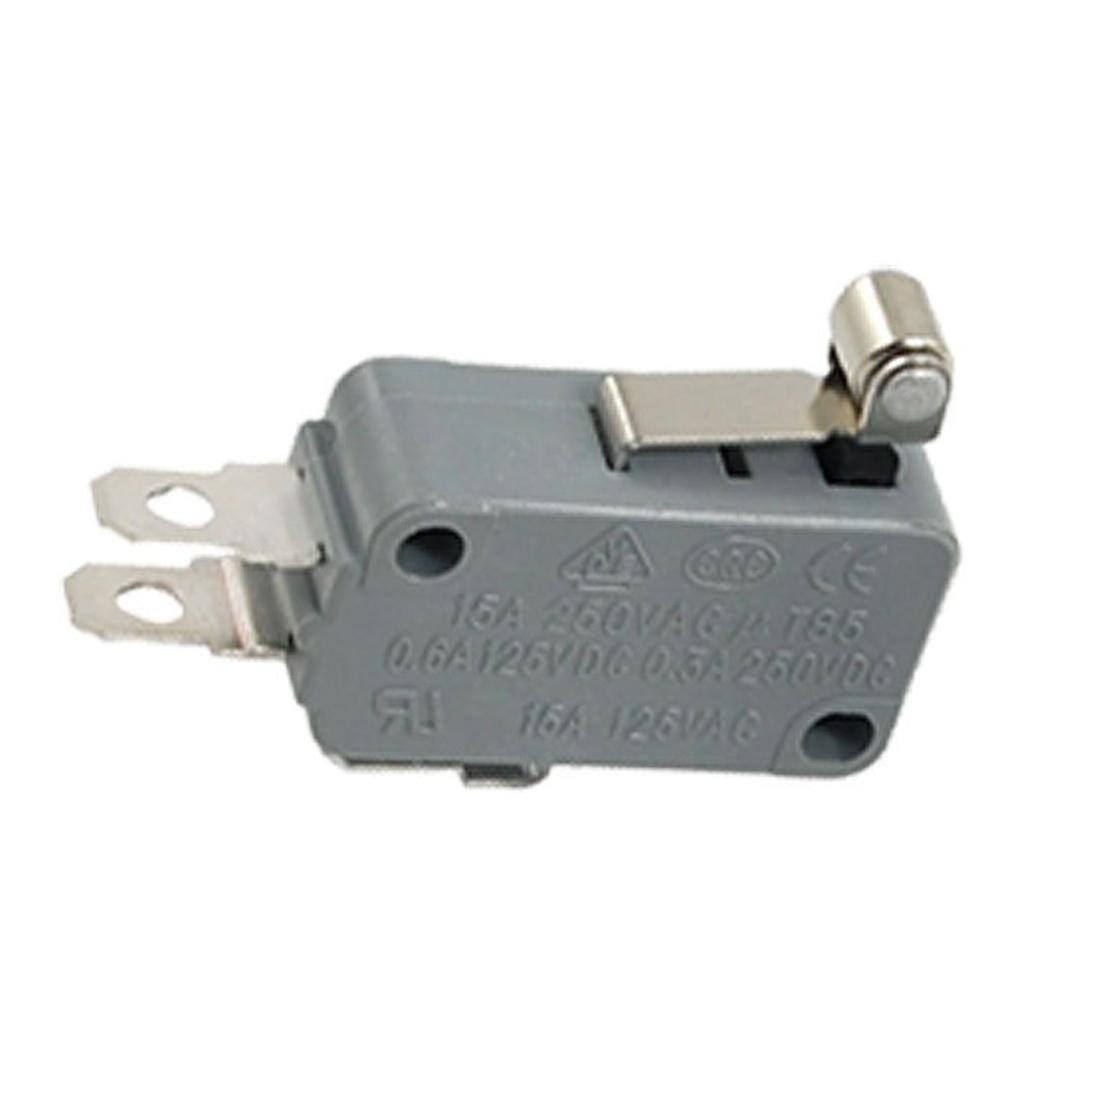 2 pcs roller short metal lever miniature micro switch b3. Black Bedroom Furniture Sets. Home Design Ideas